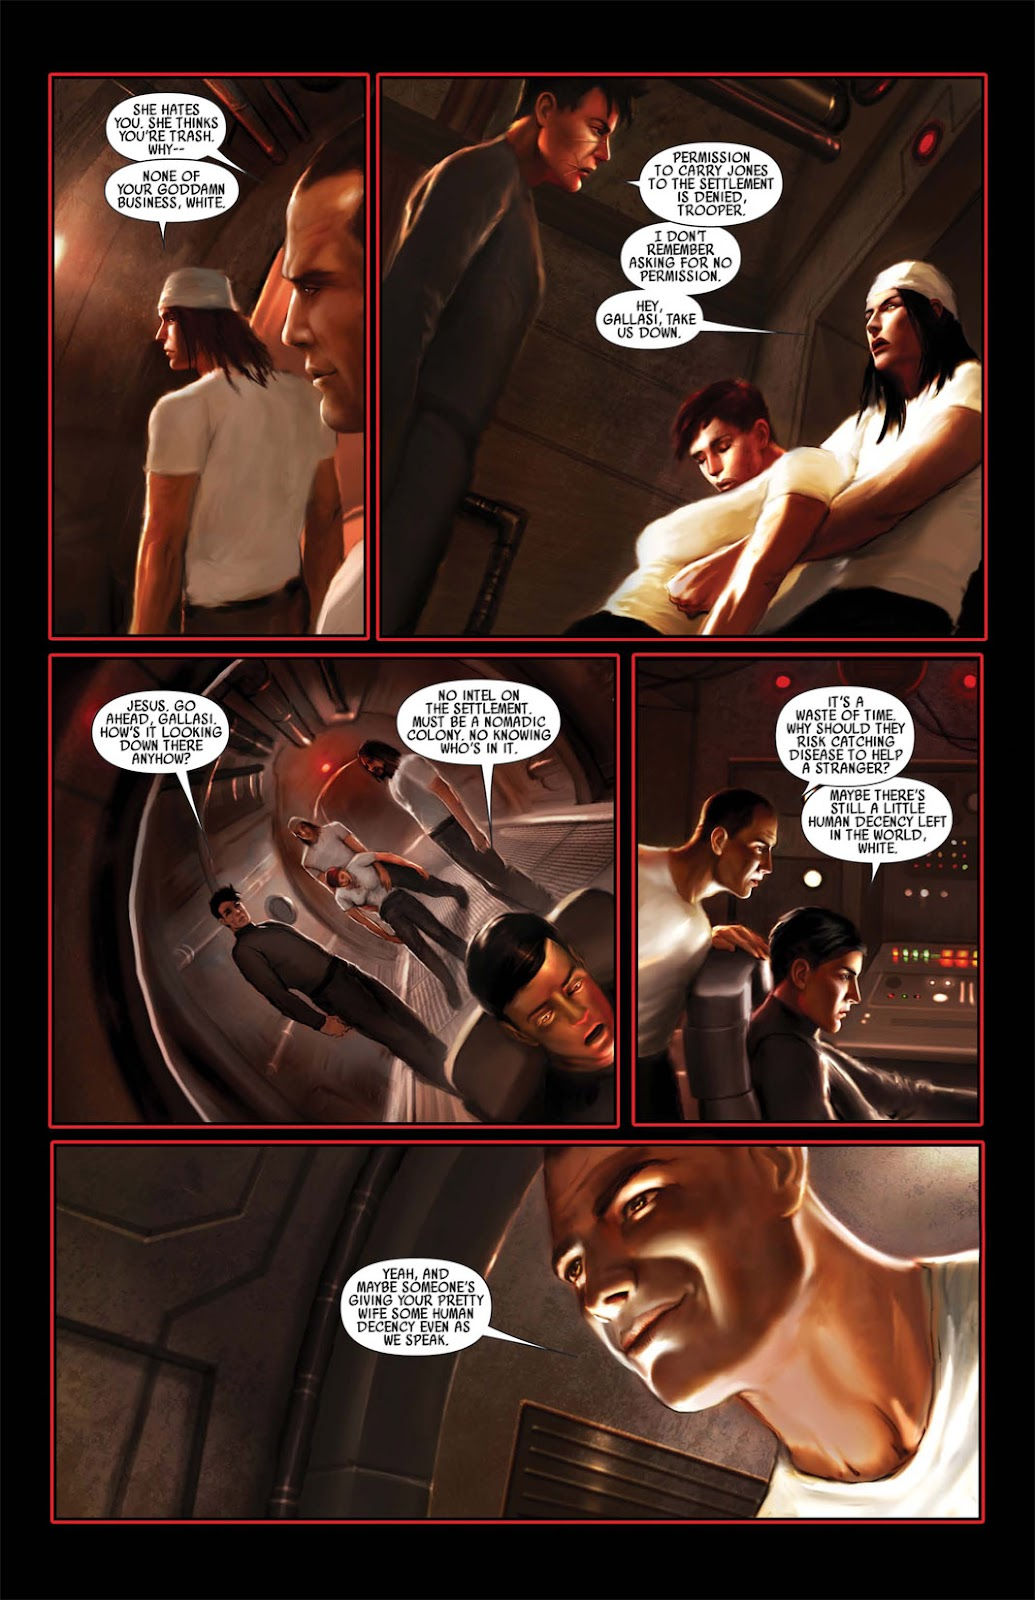 Read online After Dark comic -  Issue #1 - 39